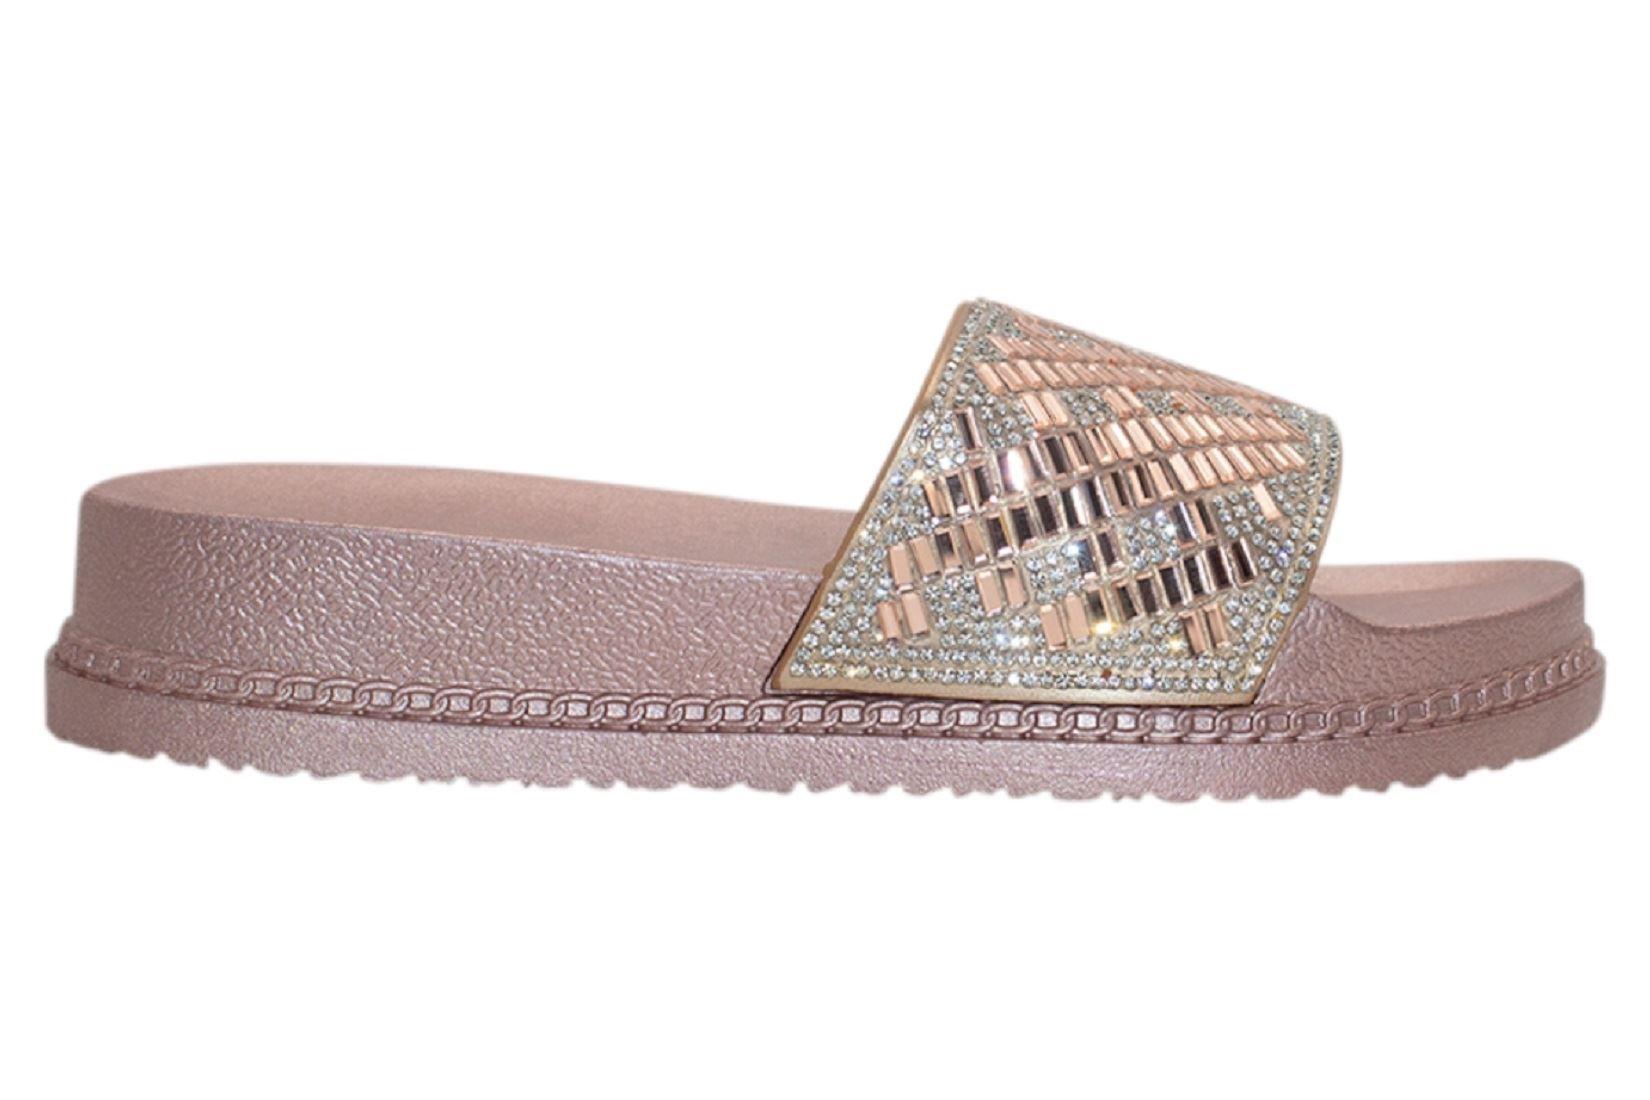 Womens-Sliders-Casual-Slippers-Mules-Ladies-Diamante-Flip-Flop-Sandals-Shoes thumbnail 36